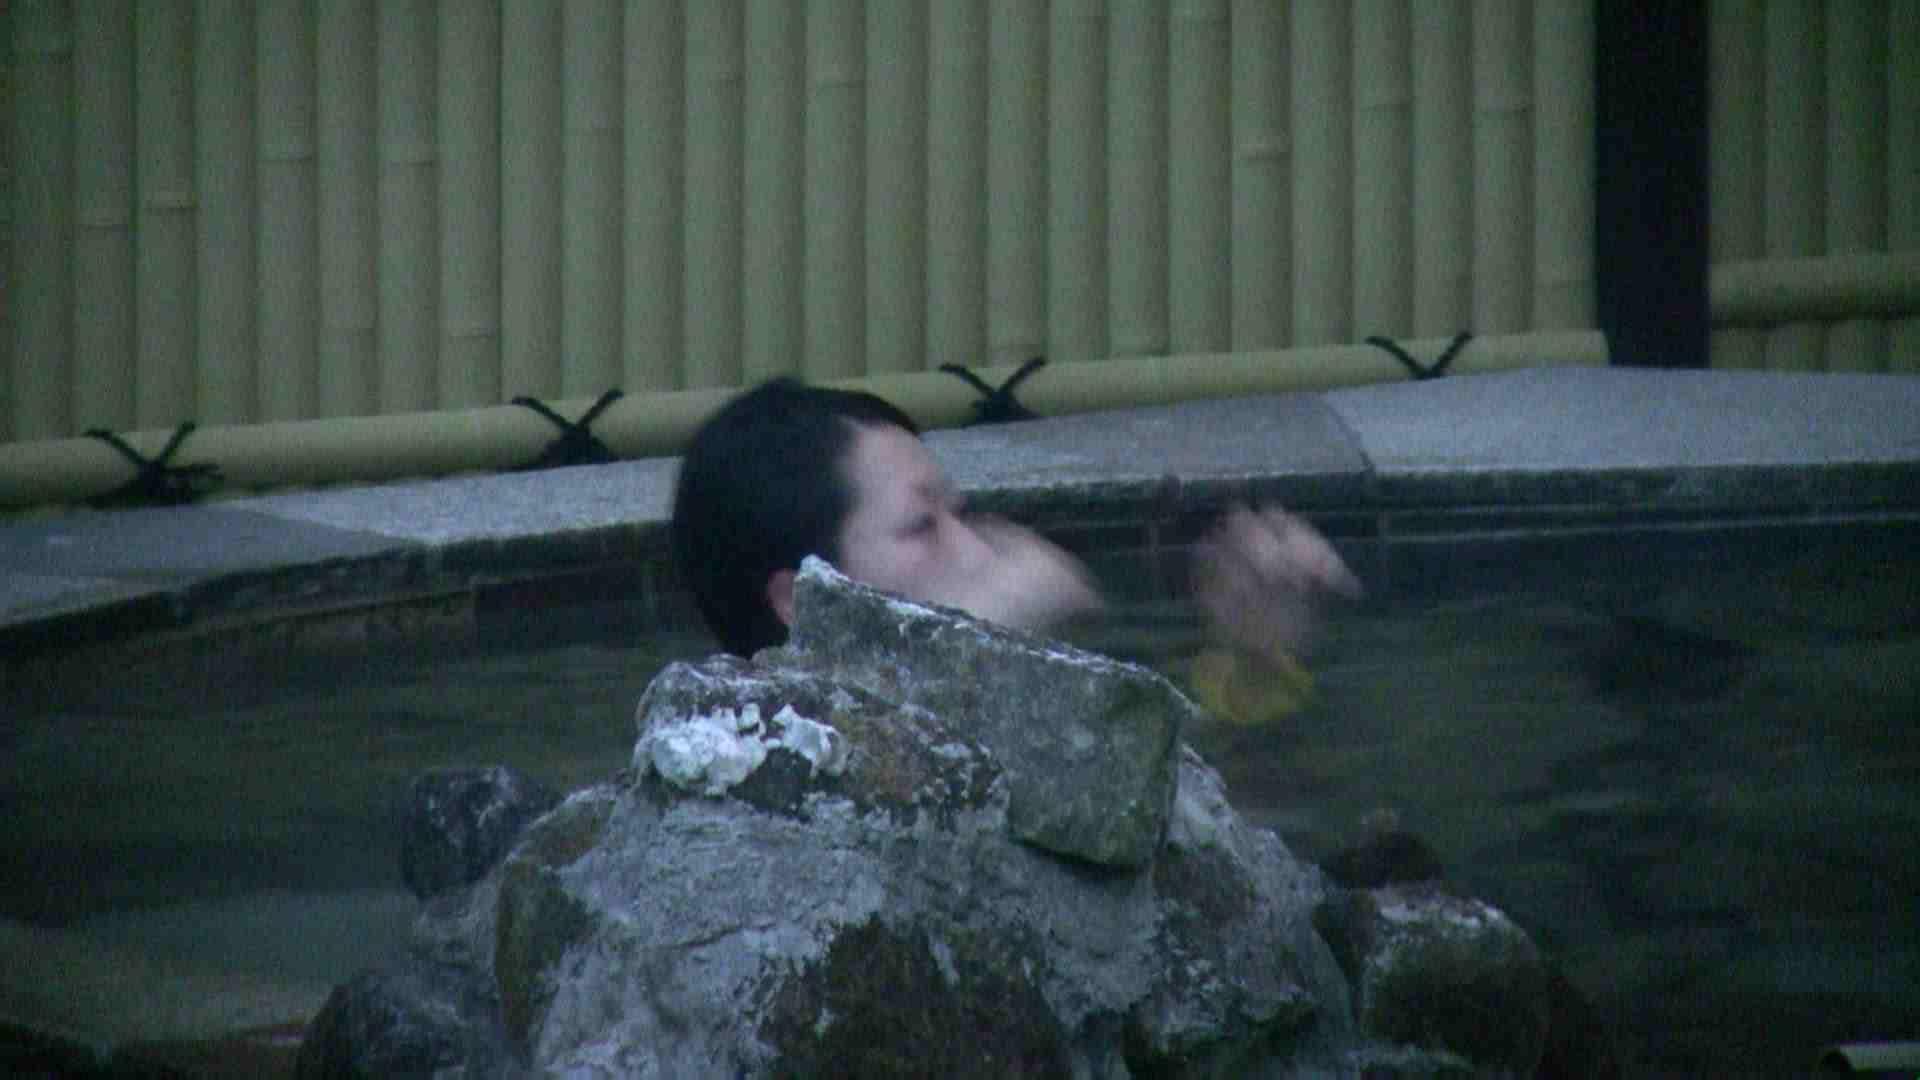 Aquaな露天風呂Vol.05【VIP】 露天風呂編 | 盗撮シリーズ  112PIX 25